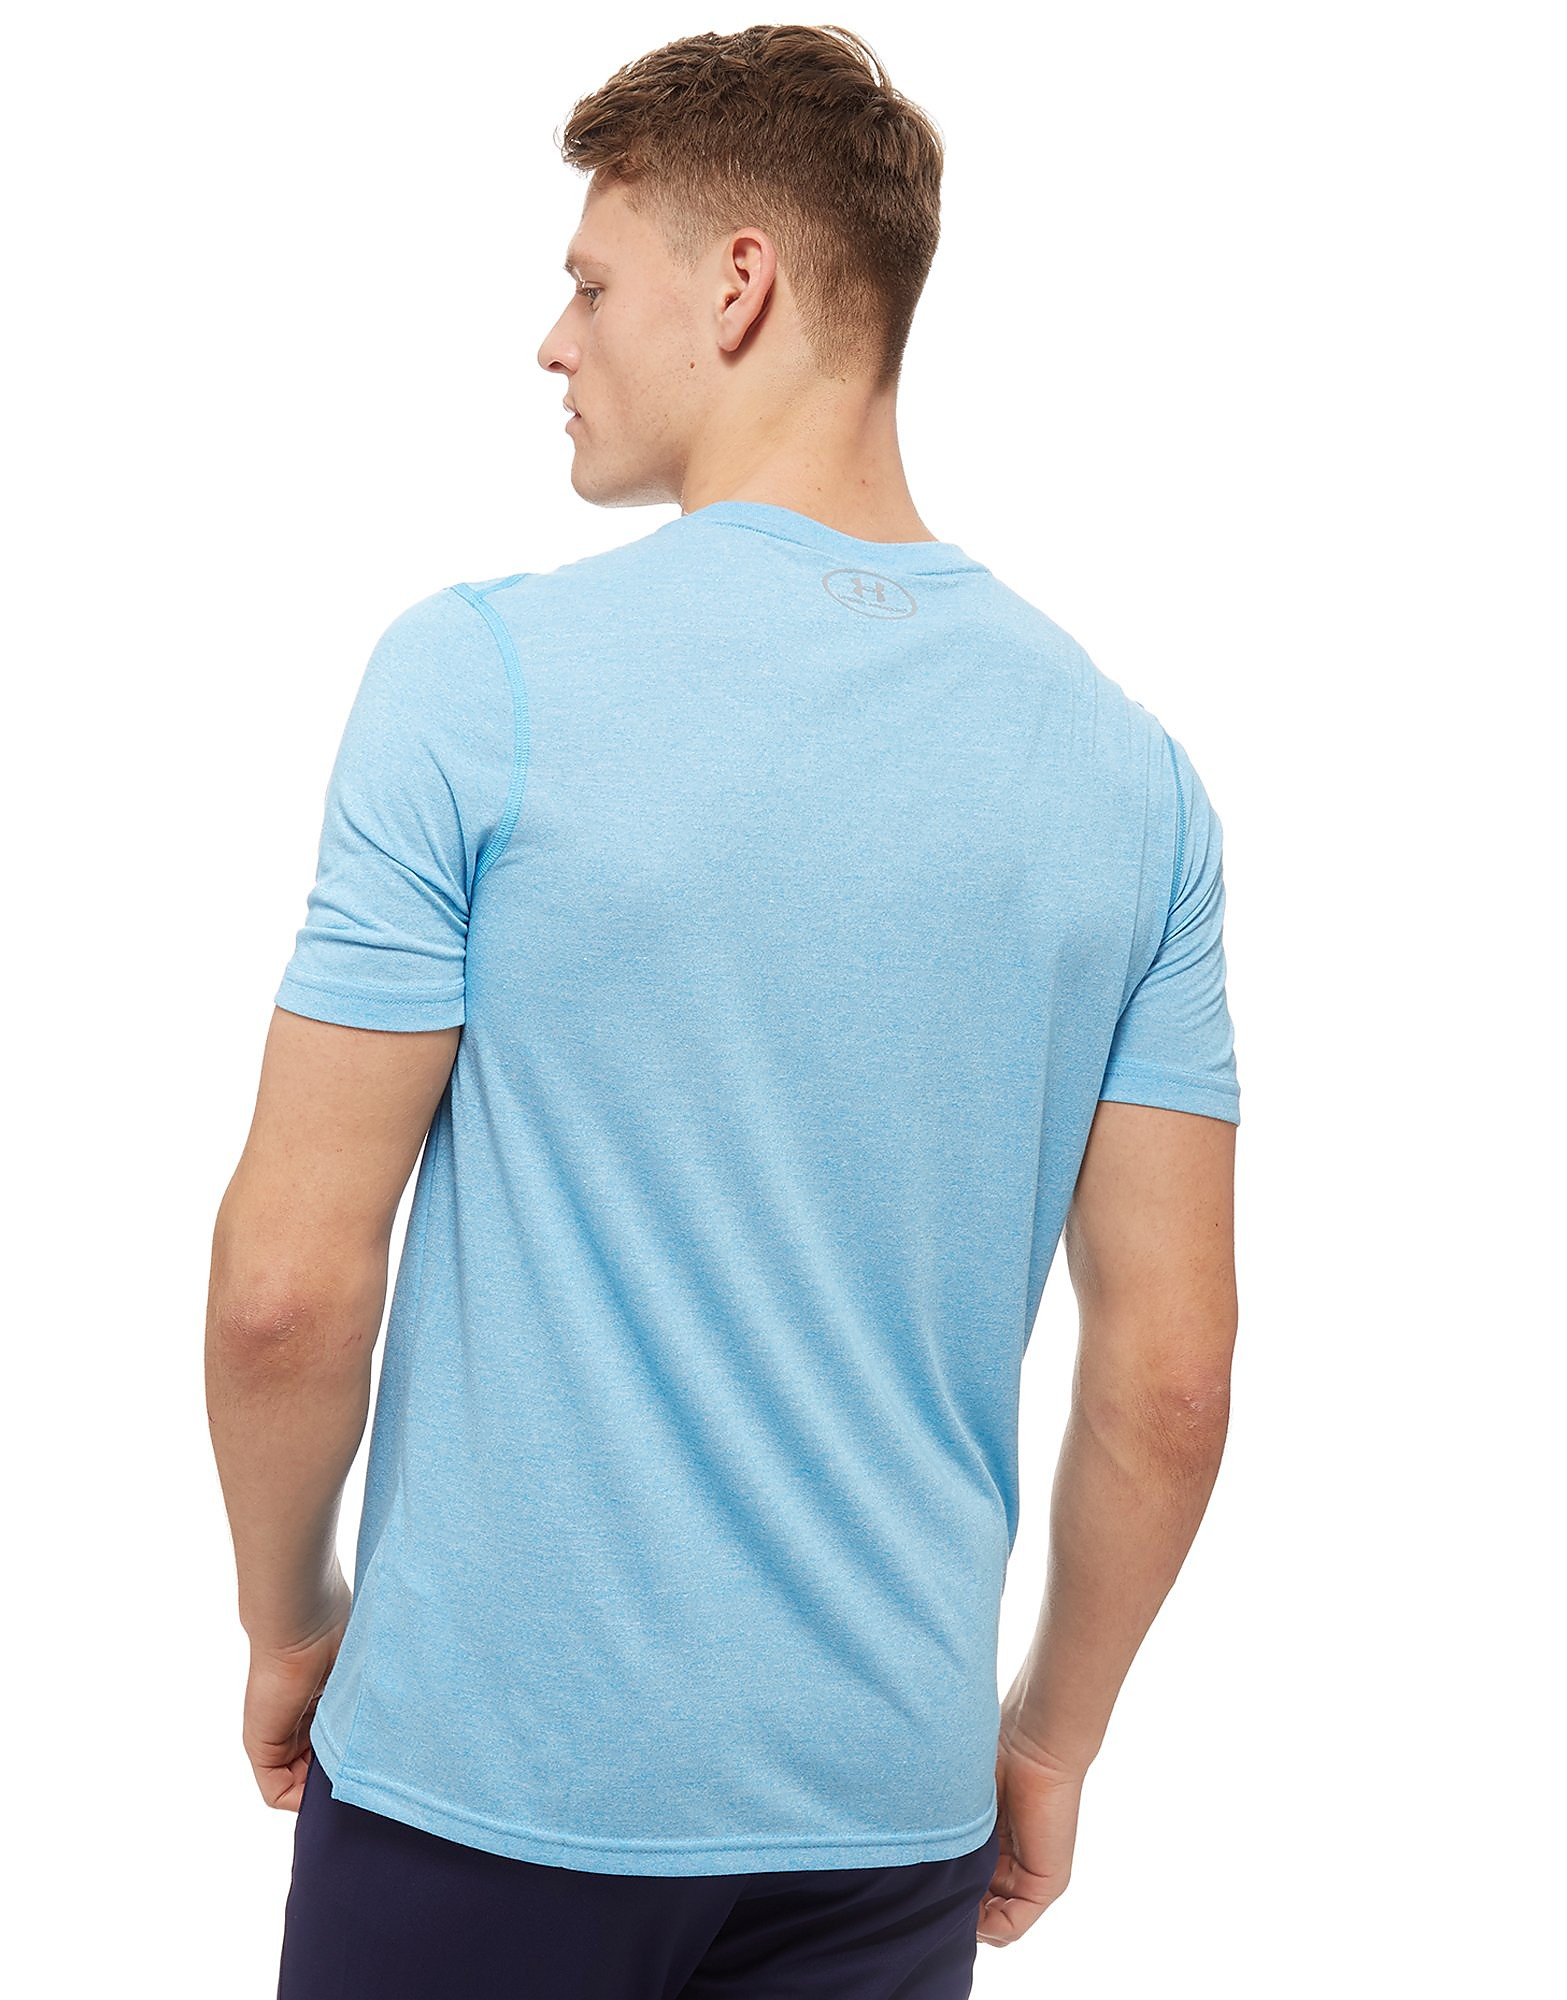 Under Armour Threadborne Fitted T-Shirt